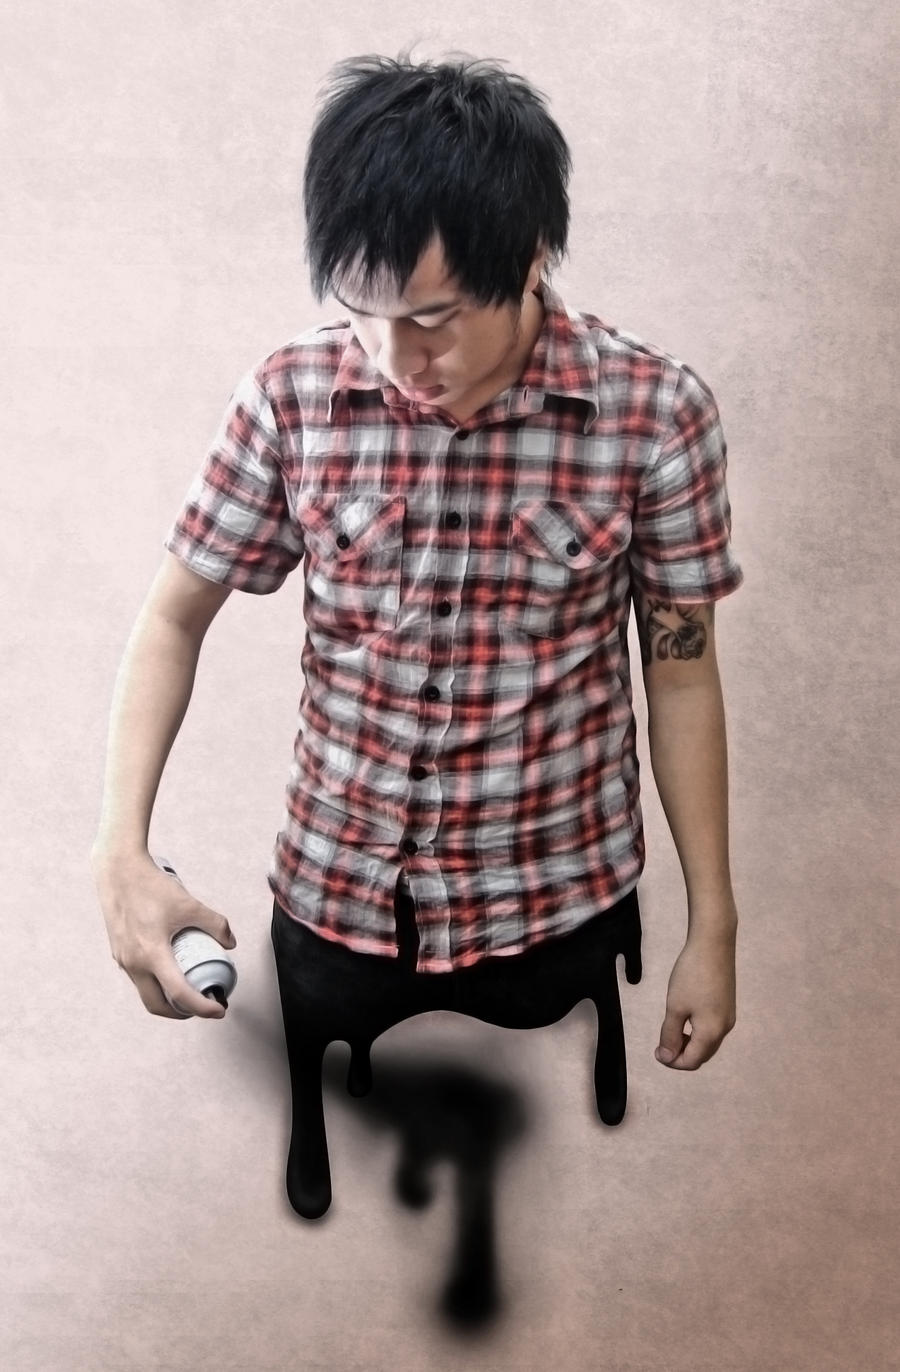 hiei-kun's Profile Picture